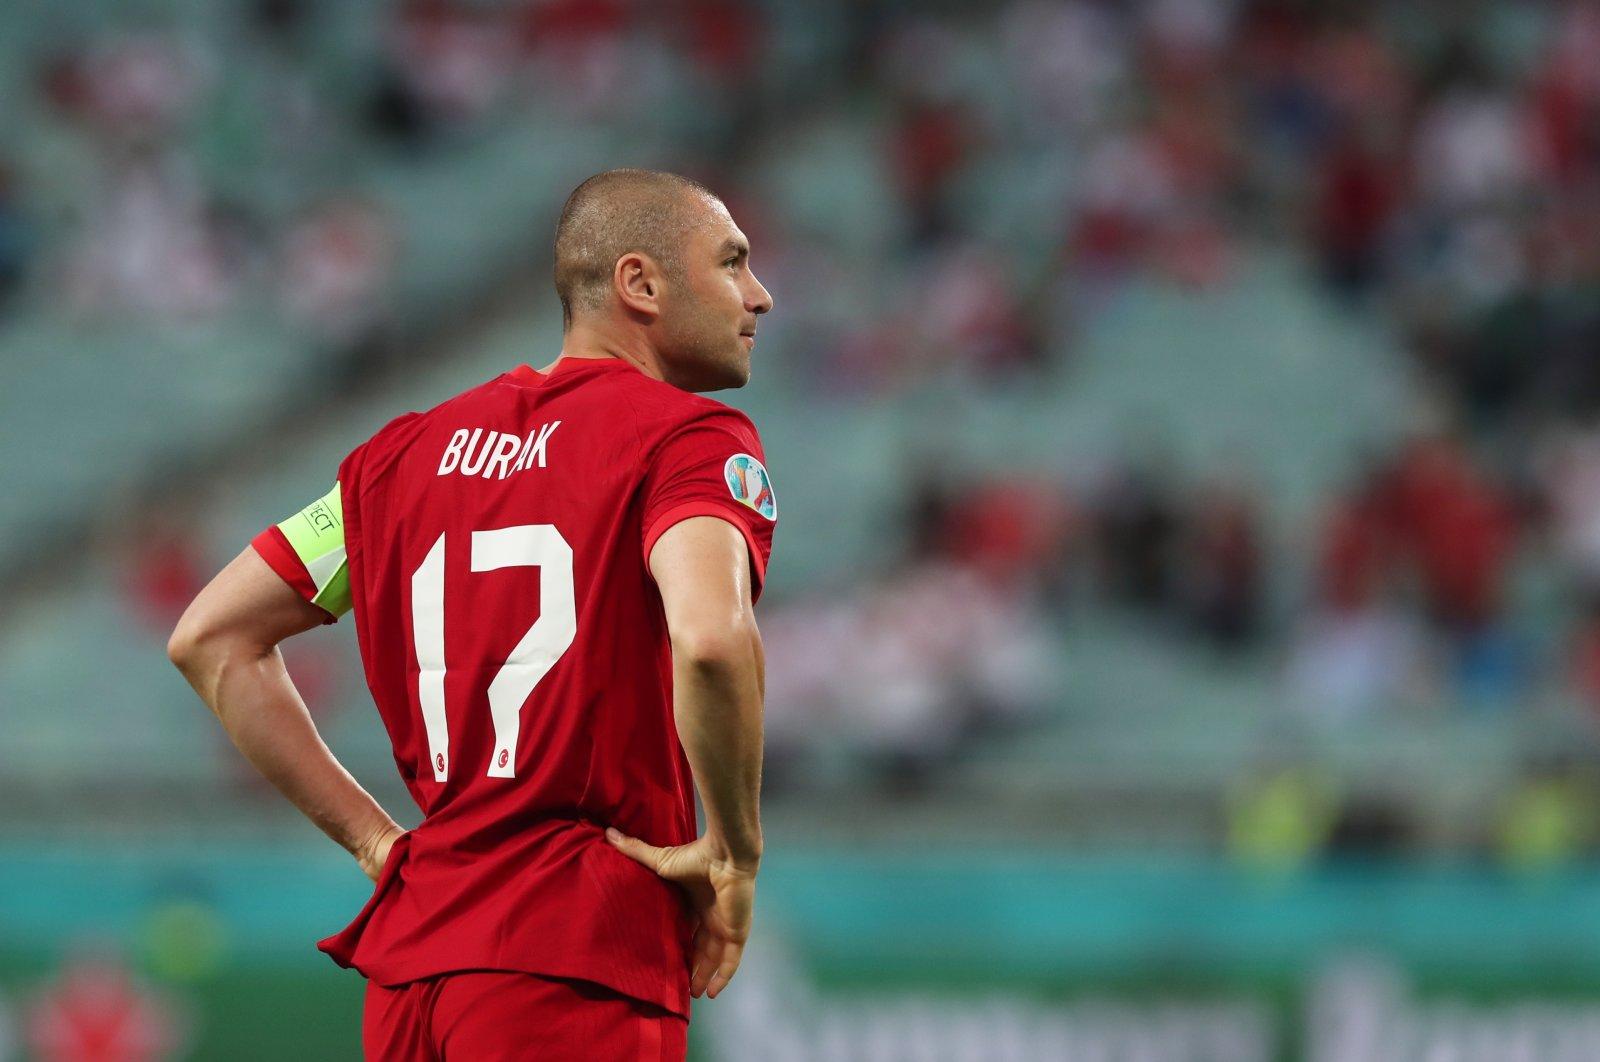 Turkey hopes to salvage Euro 2020 campaign in Switzerland test